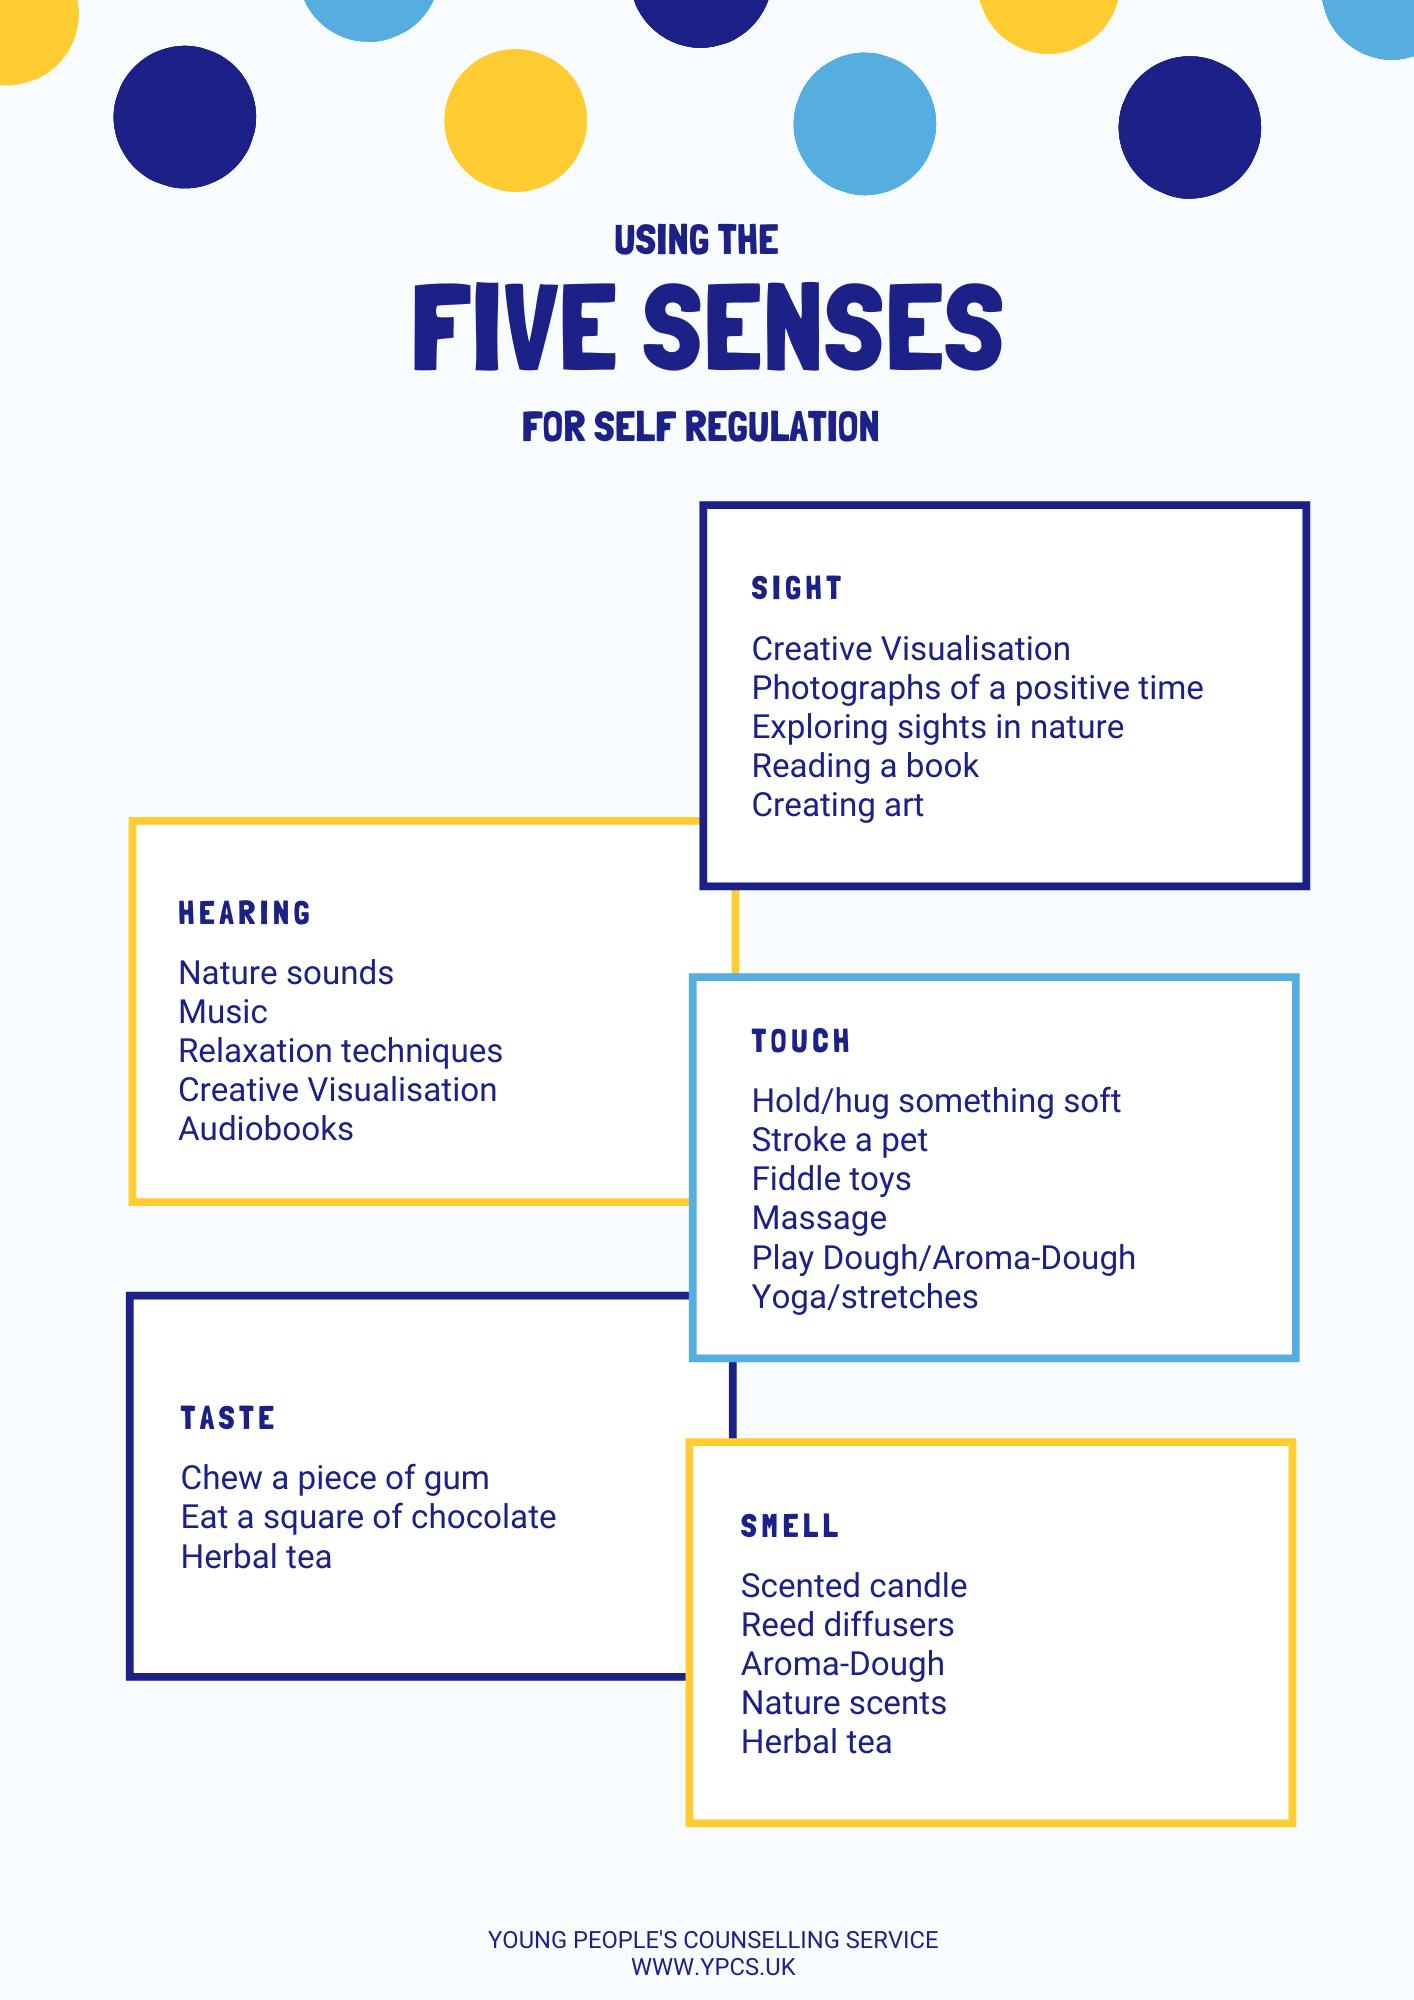 Using the Five Senses for Self-Regulation